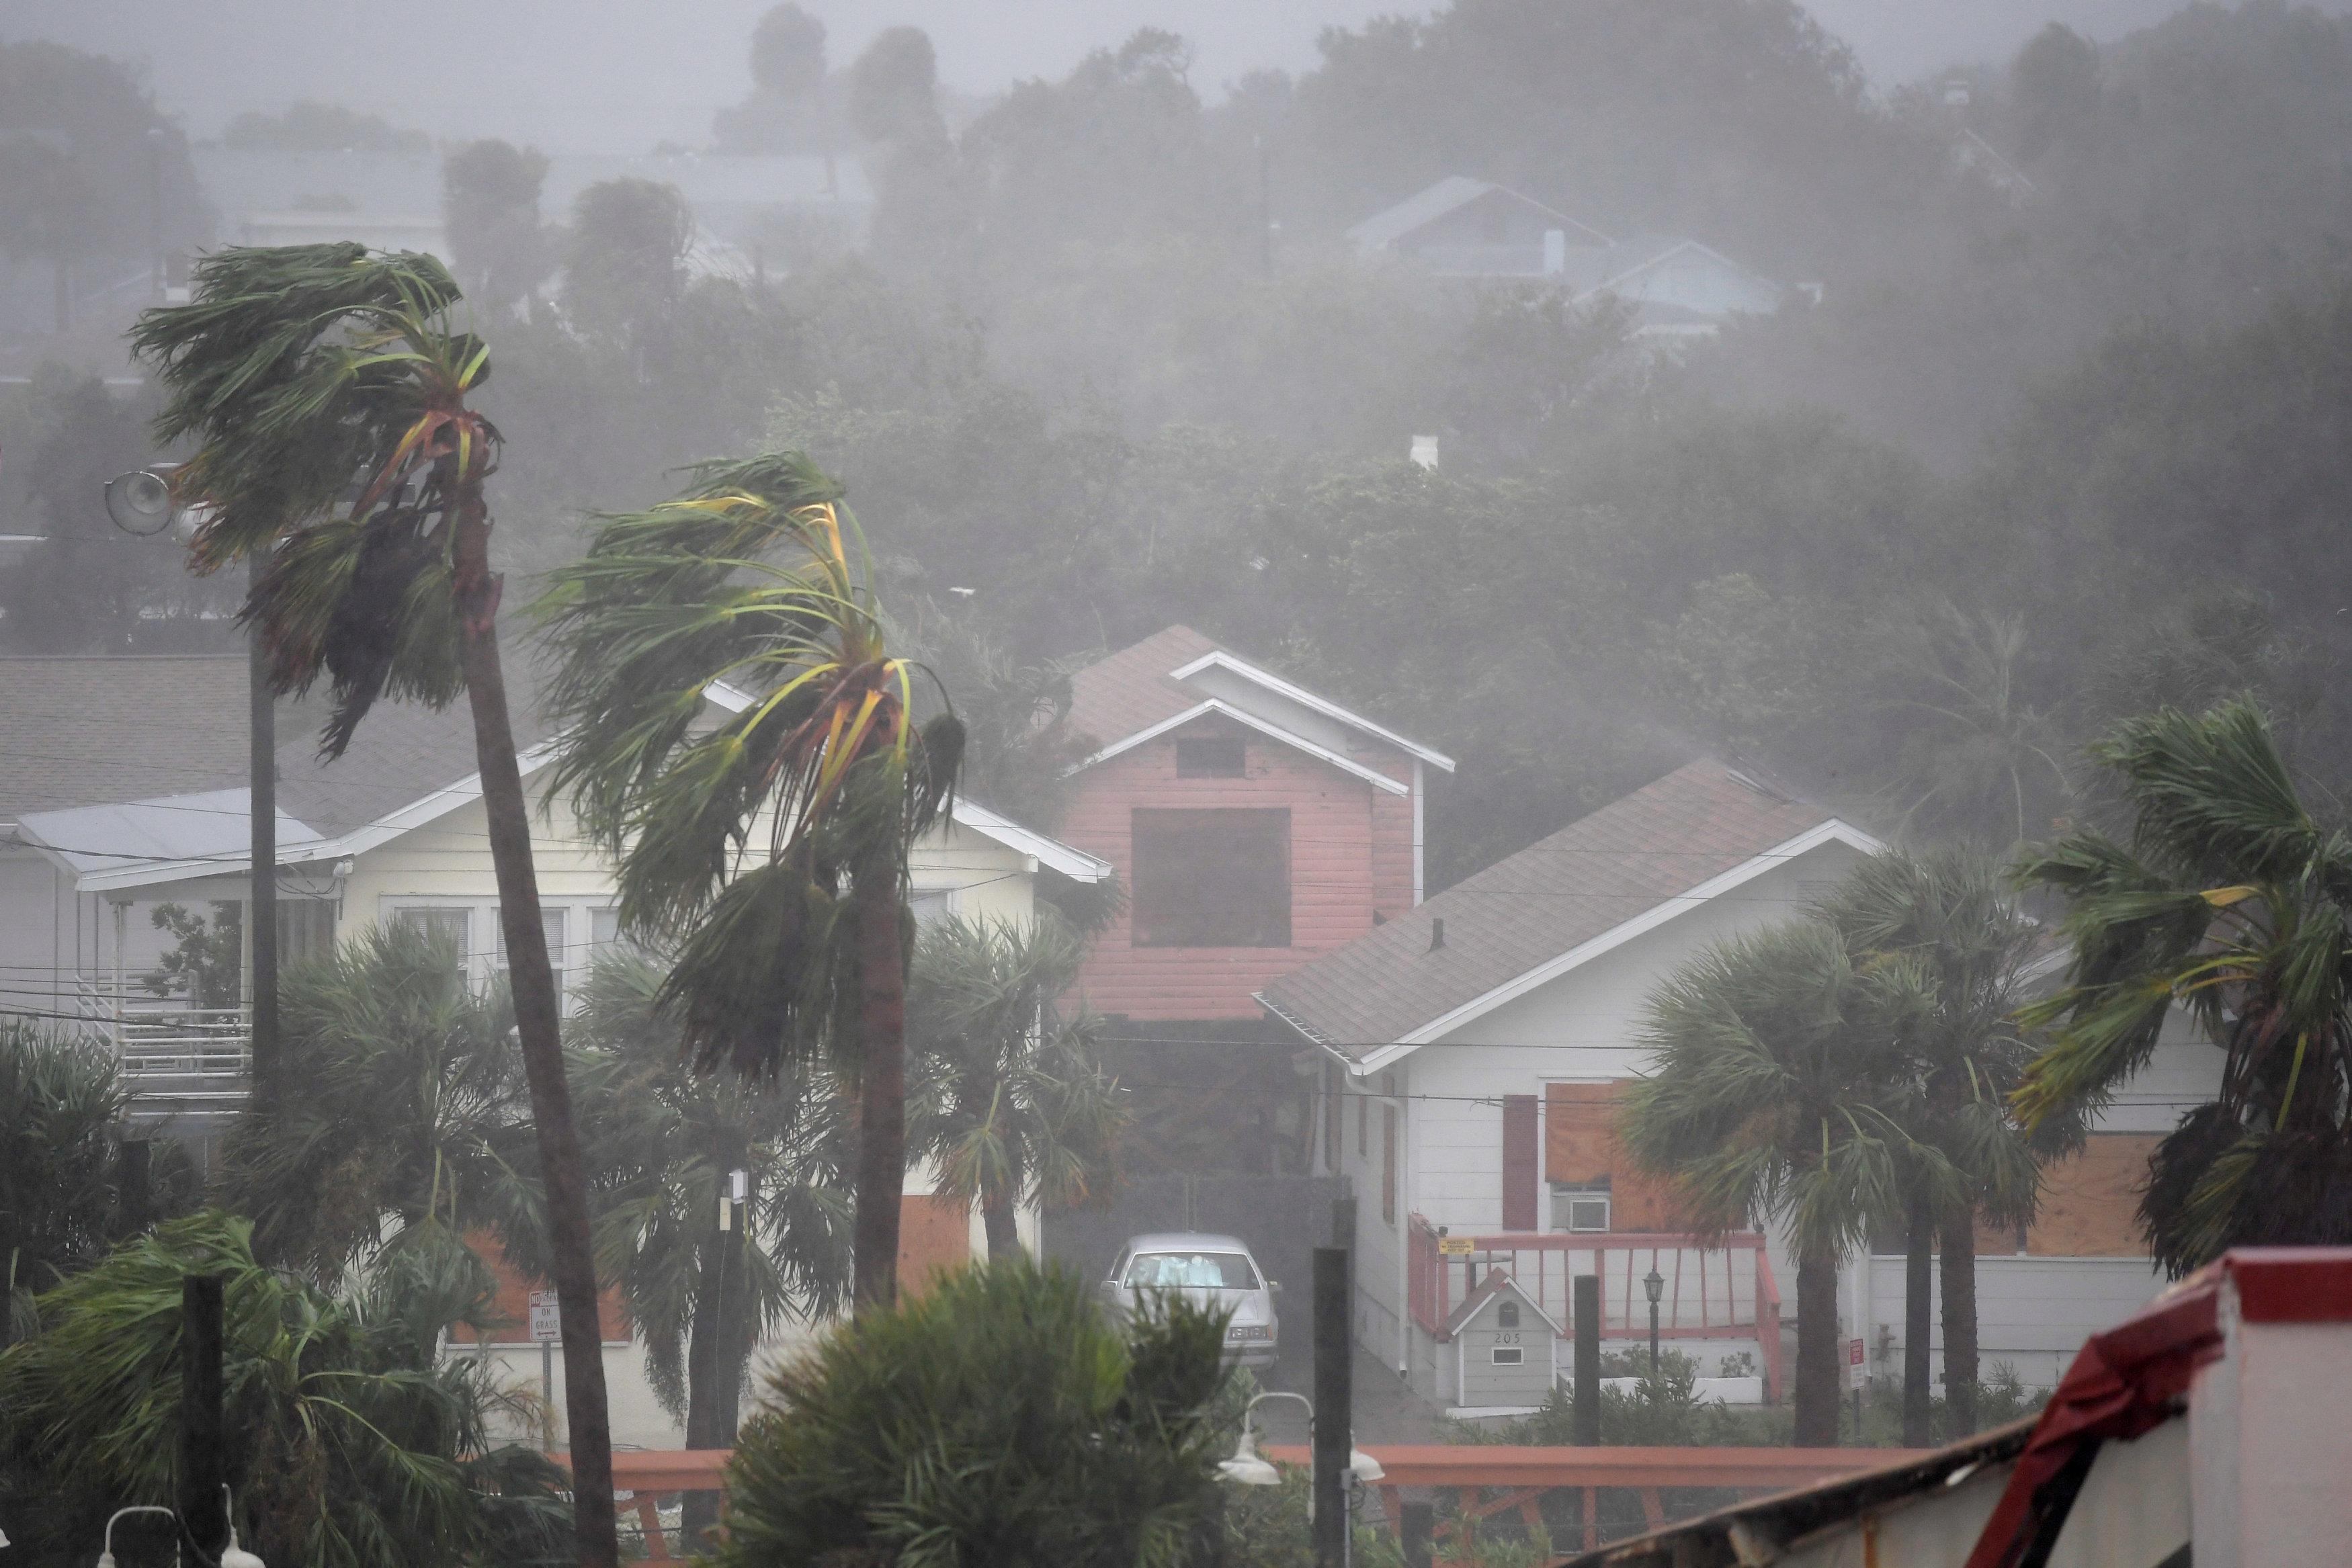 Rain batters homes as the eye of Hurricane Matthew passes Daytona Beach, Florida, U.S. October 7, 2016.  REUTERS/Phelan Ebenhack     TPX IMAGES OF THE DAY